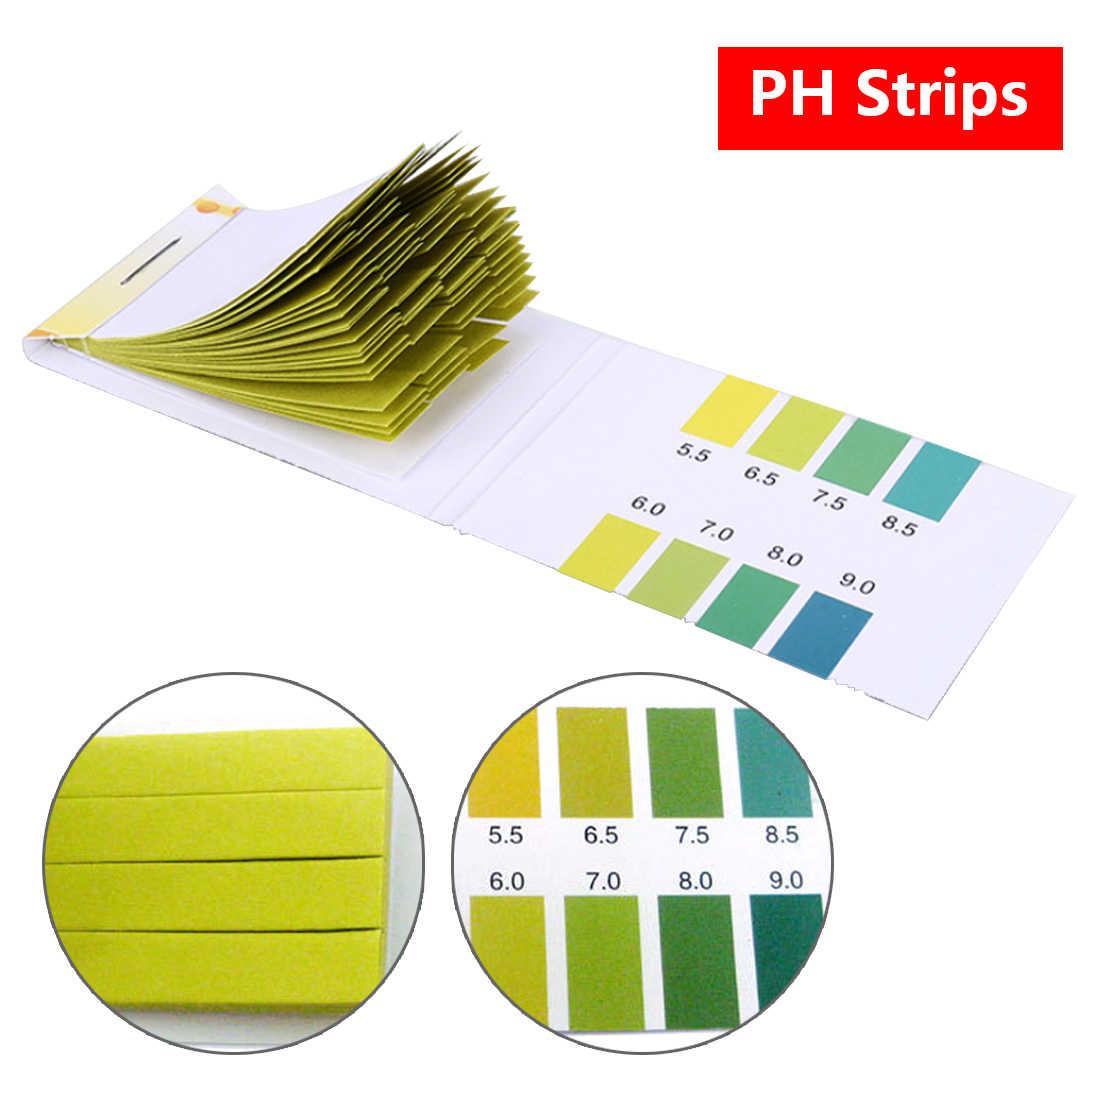 Litmus paper PH test paper 80 Strips PH Range 5 5 9 0 PH